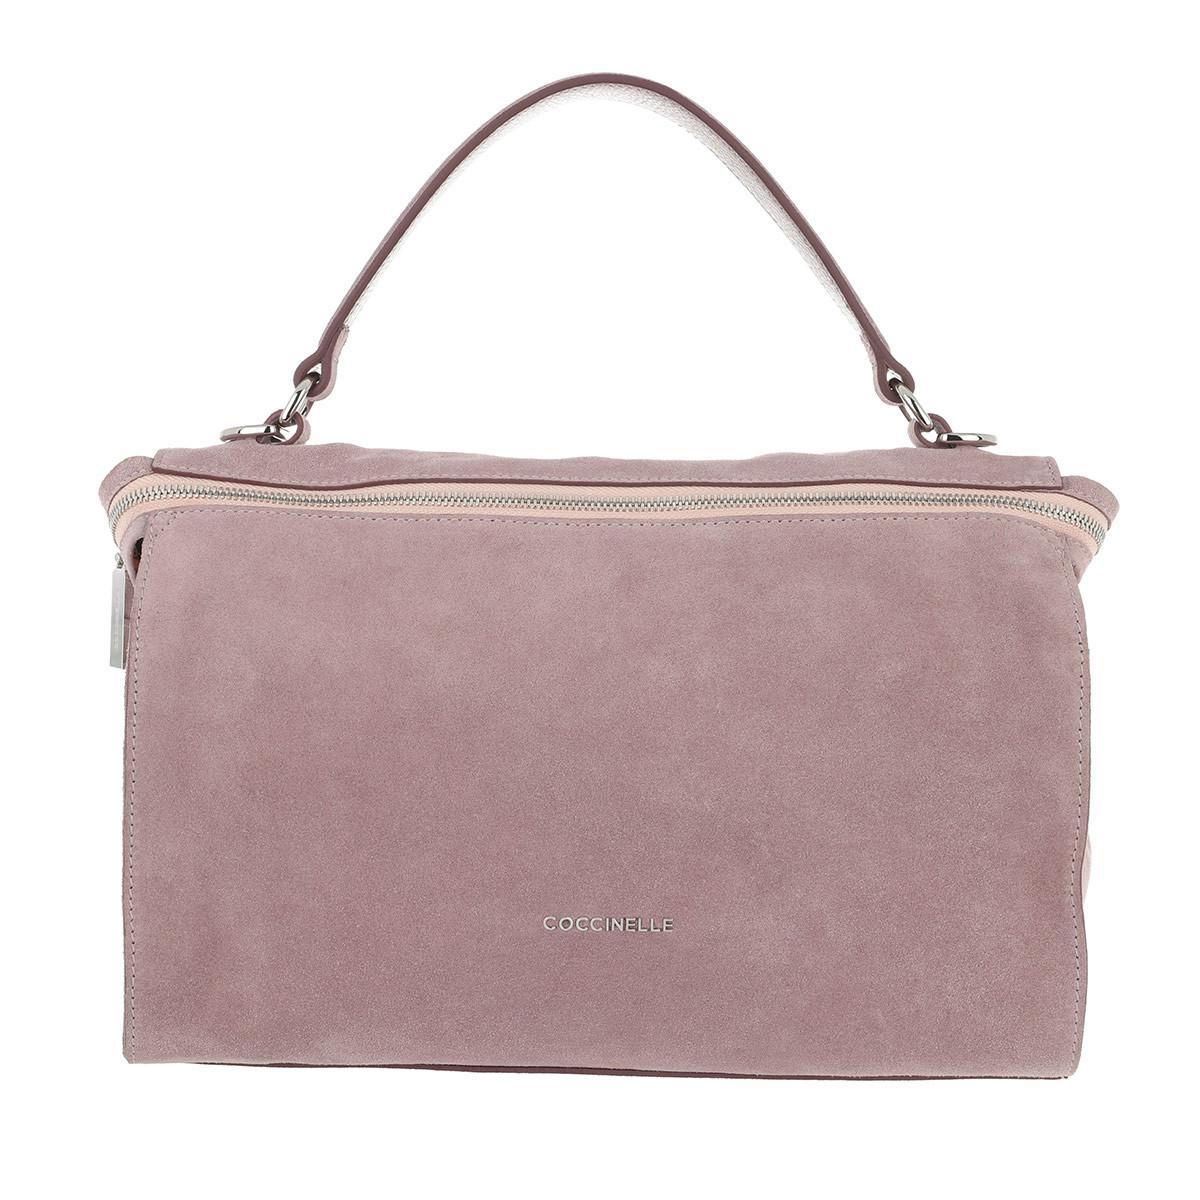 Coccinelle Satchel Bags - Arlettis Suede Crossbody Bag Pivoine - - Satchel Bags for ladies Discount Footlocker Finishline Outlet Inexpensive Great Deals Sale Online XCoDrLNv